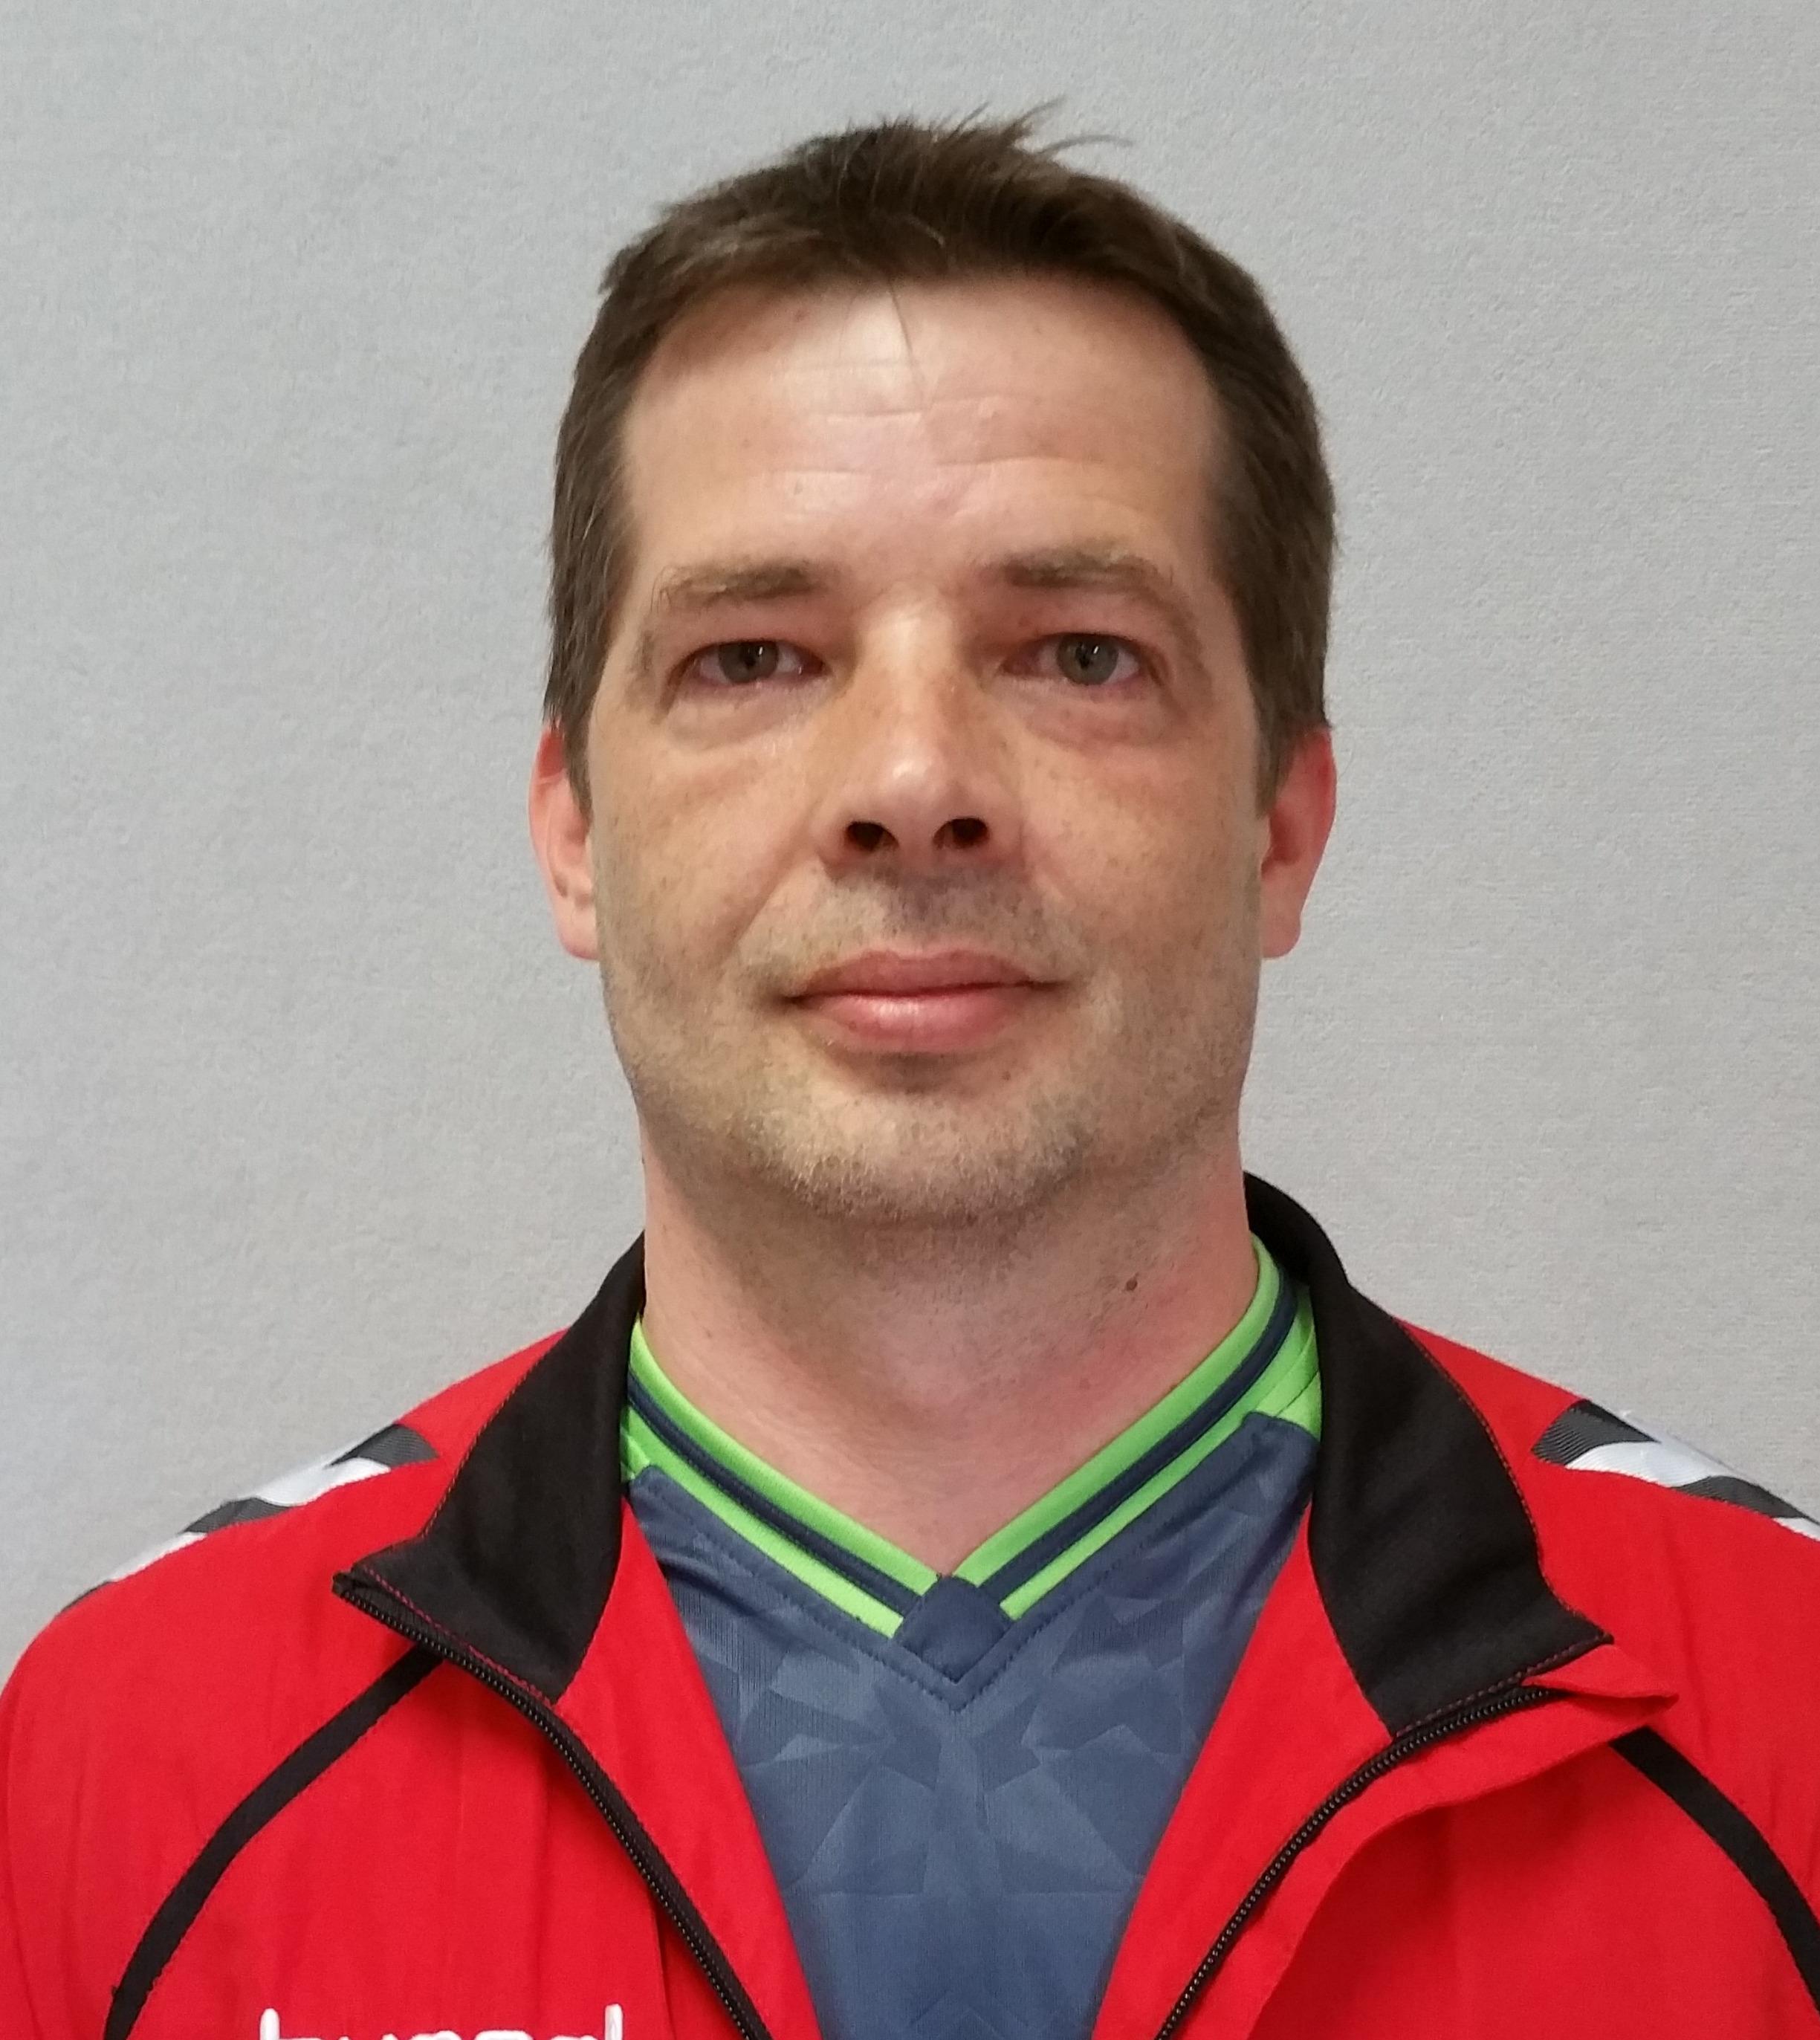 Kampfrichter - SV Lok Leipzig-Mitte e V  - Abteilung Handball